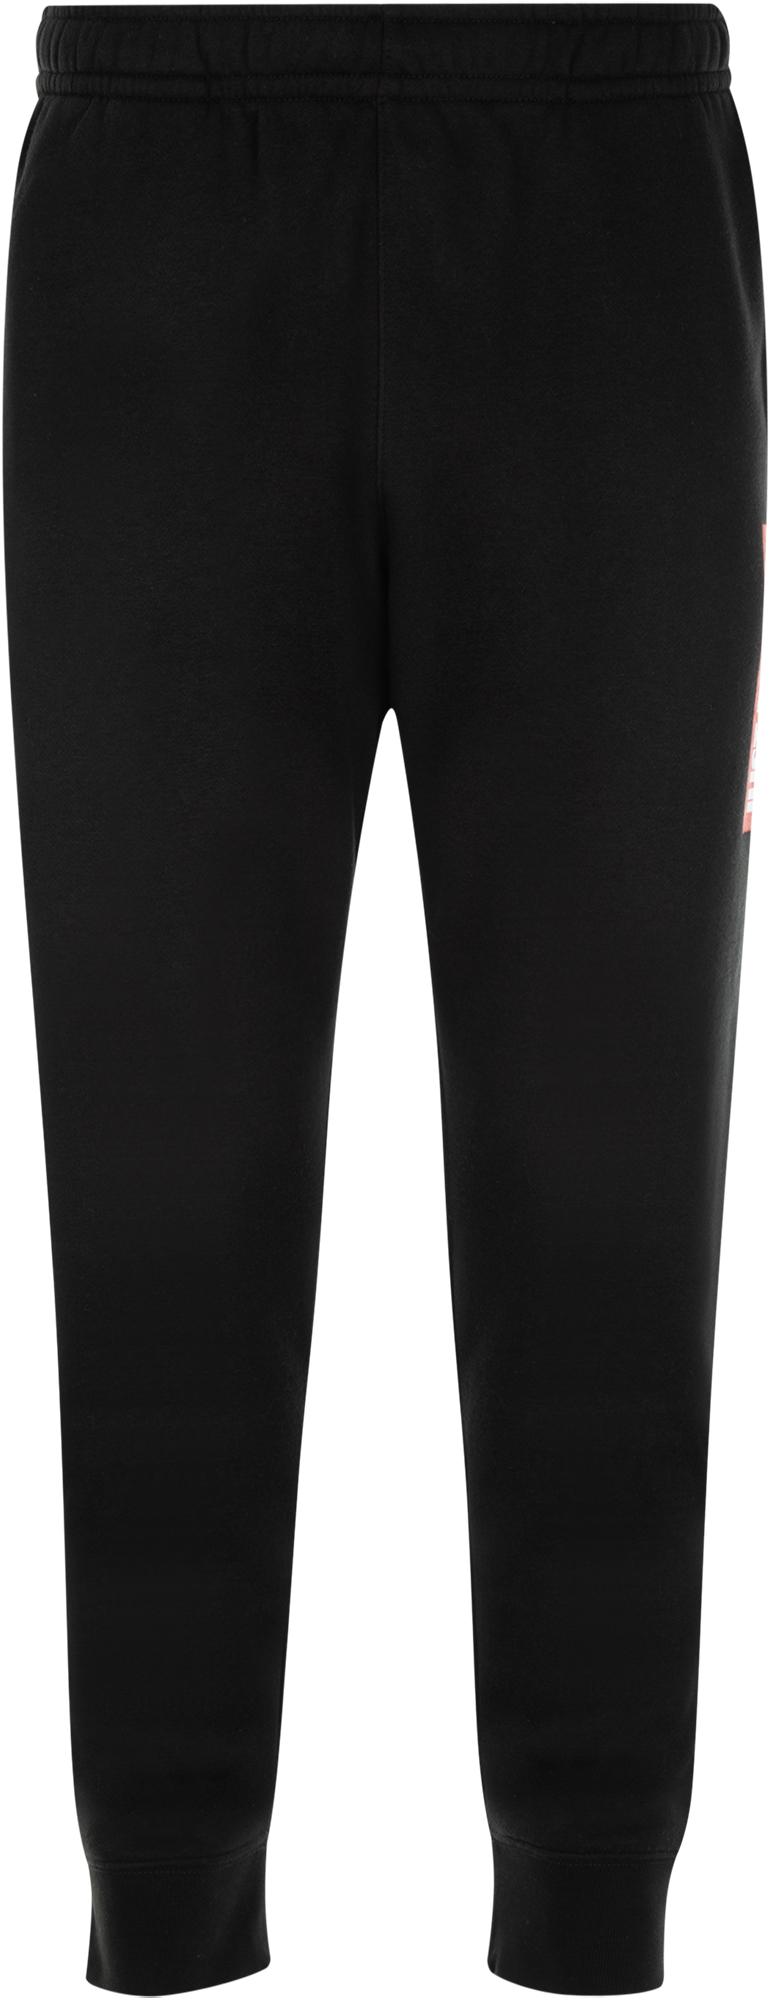 Nike Брюки мужские JDI, размер 54-56